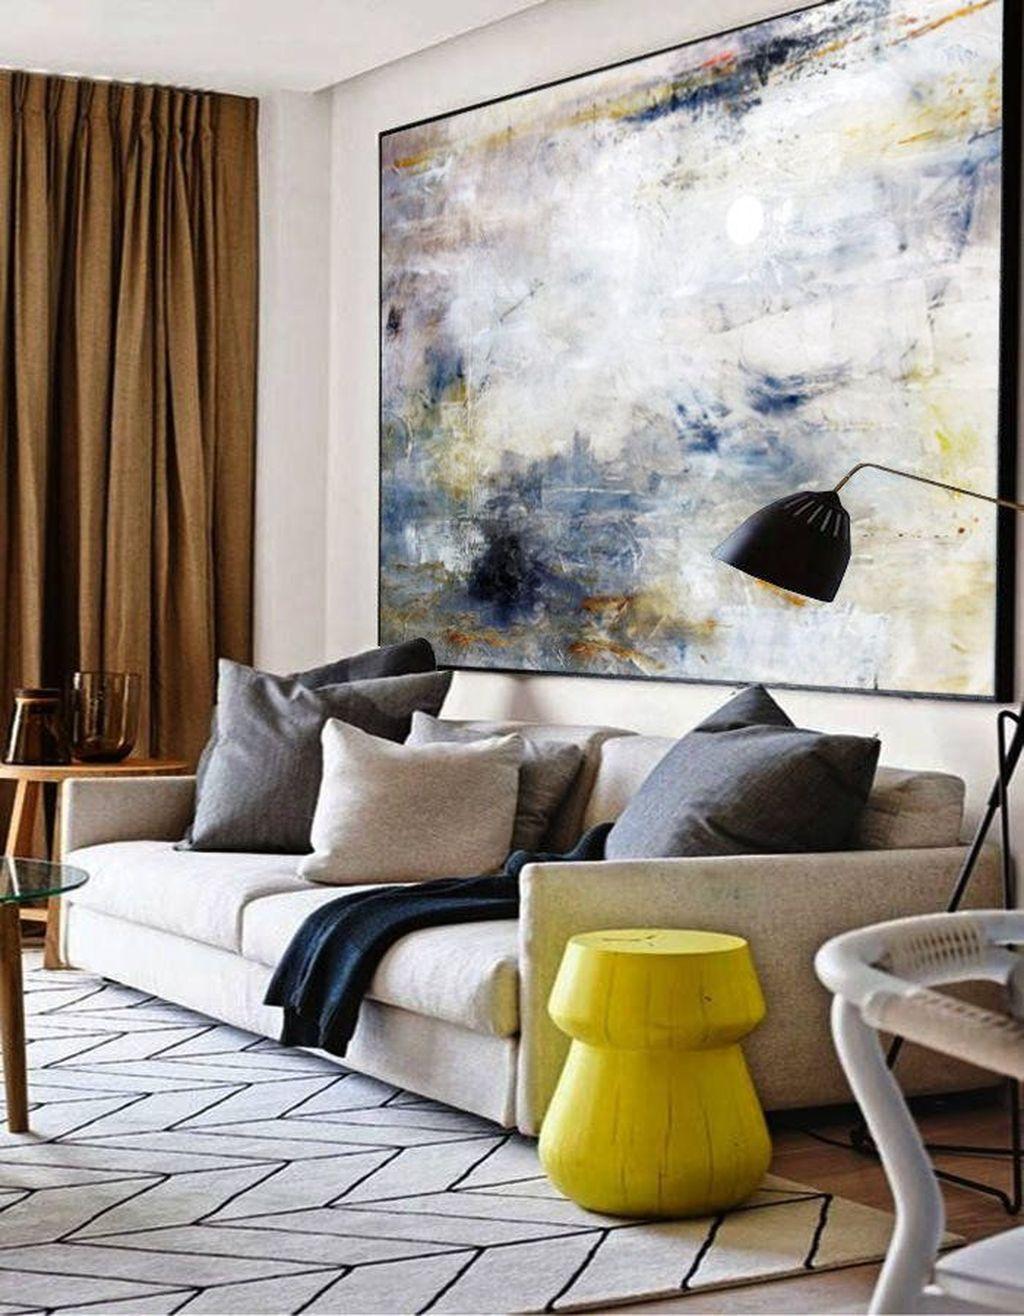 Inspiring Modern Home Furnishings Design Ideas 34